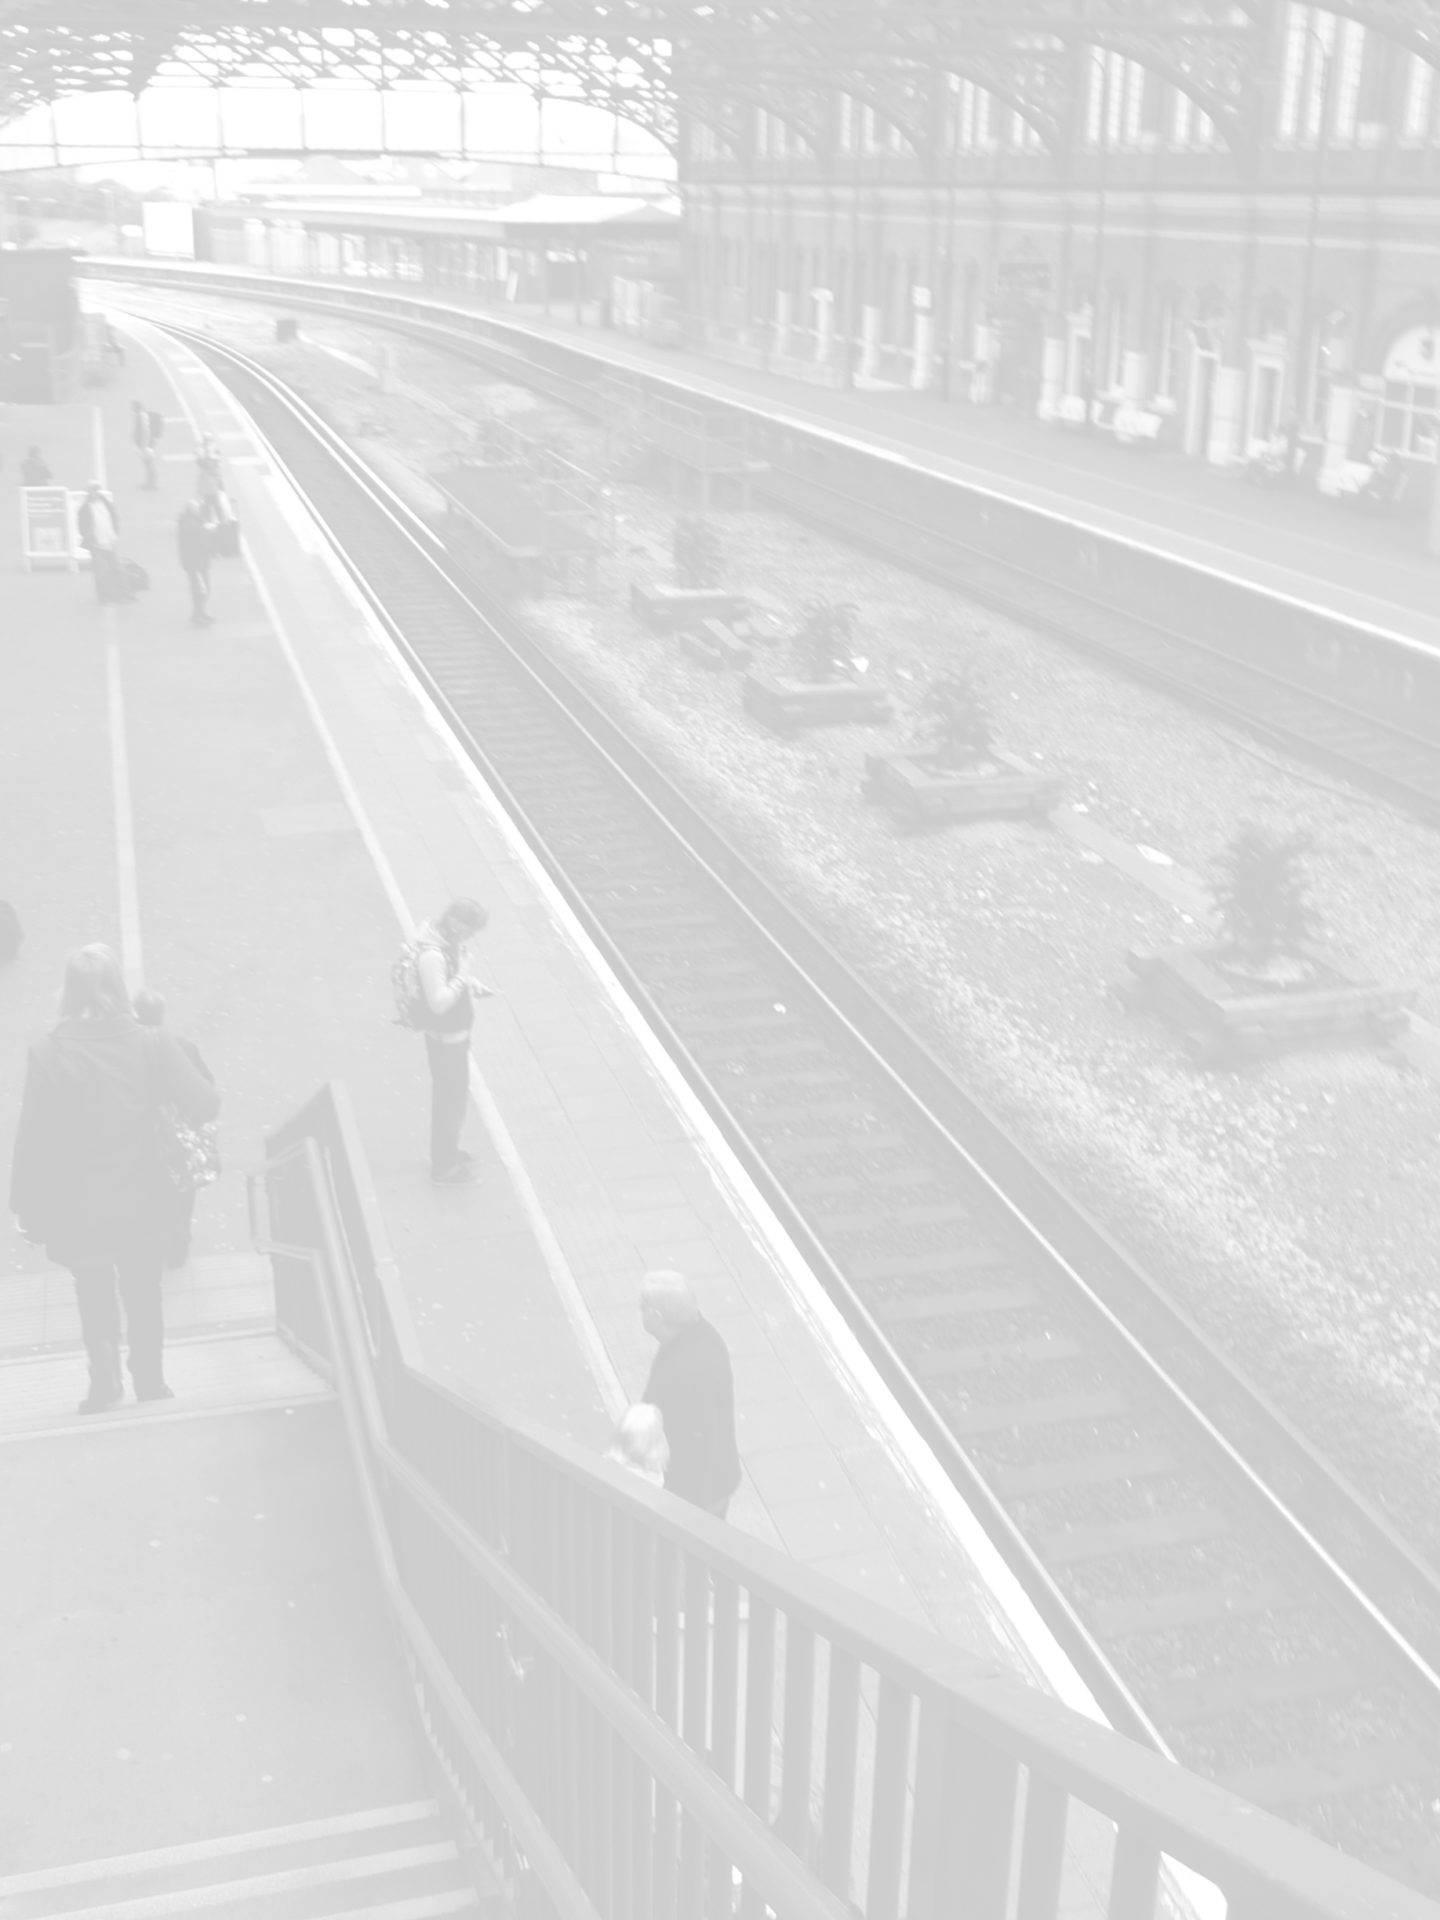 bournemouth seo image of bournemouth railway station